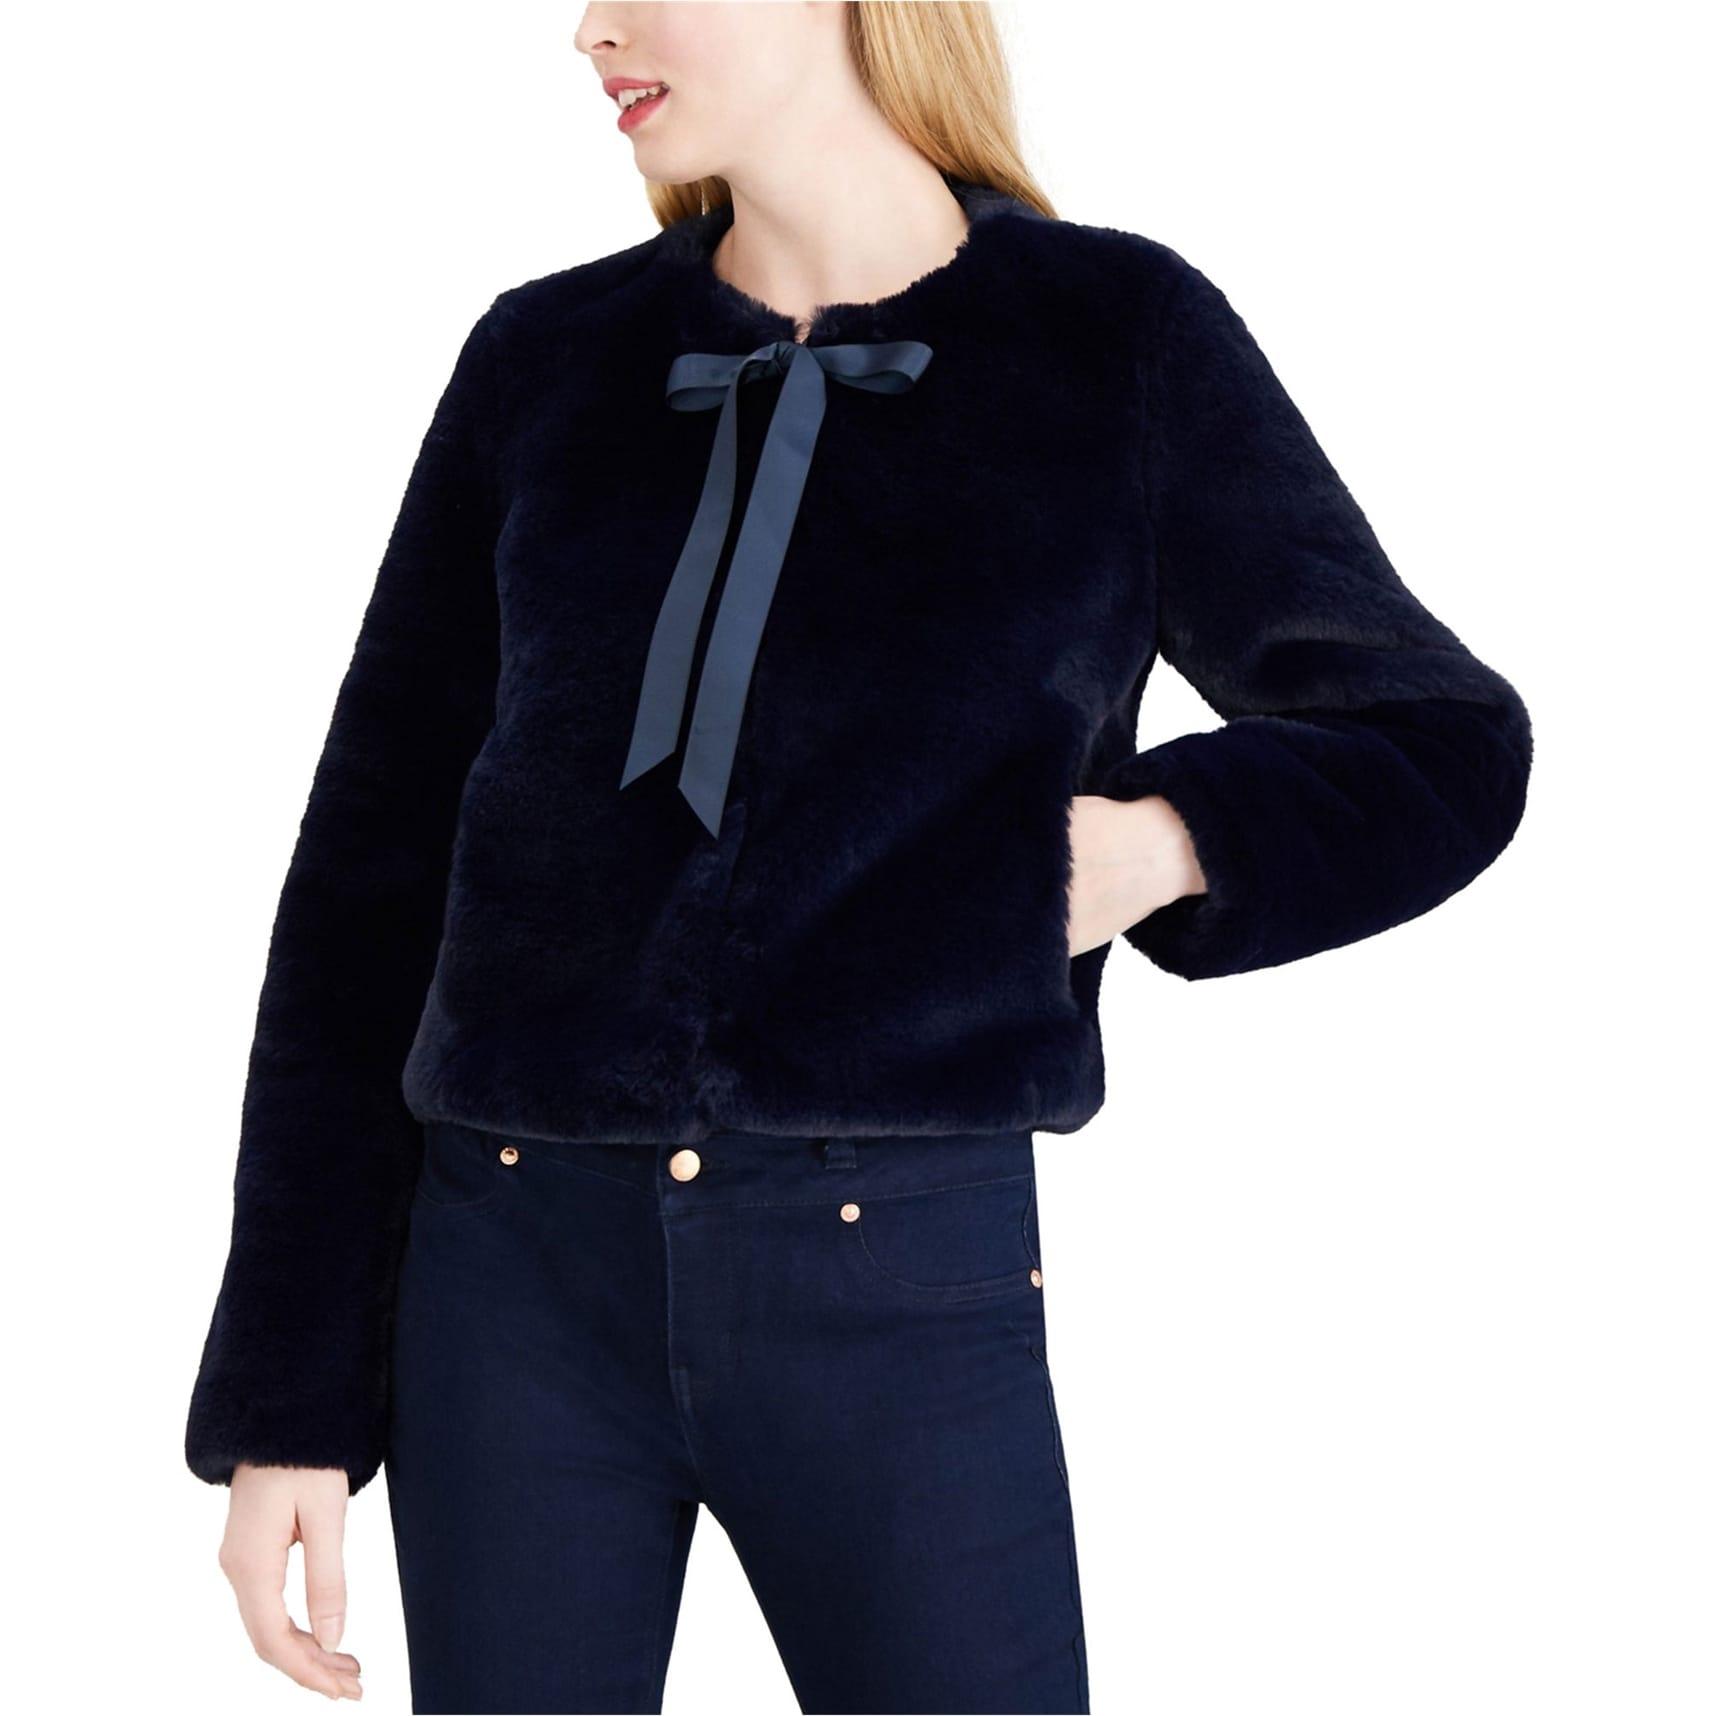 Maison Jules Womens Tie Sleeve Trench Coat